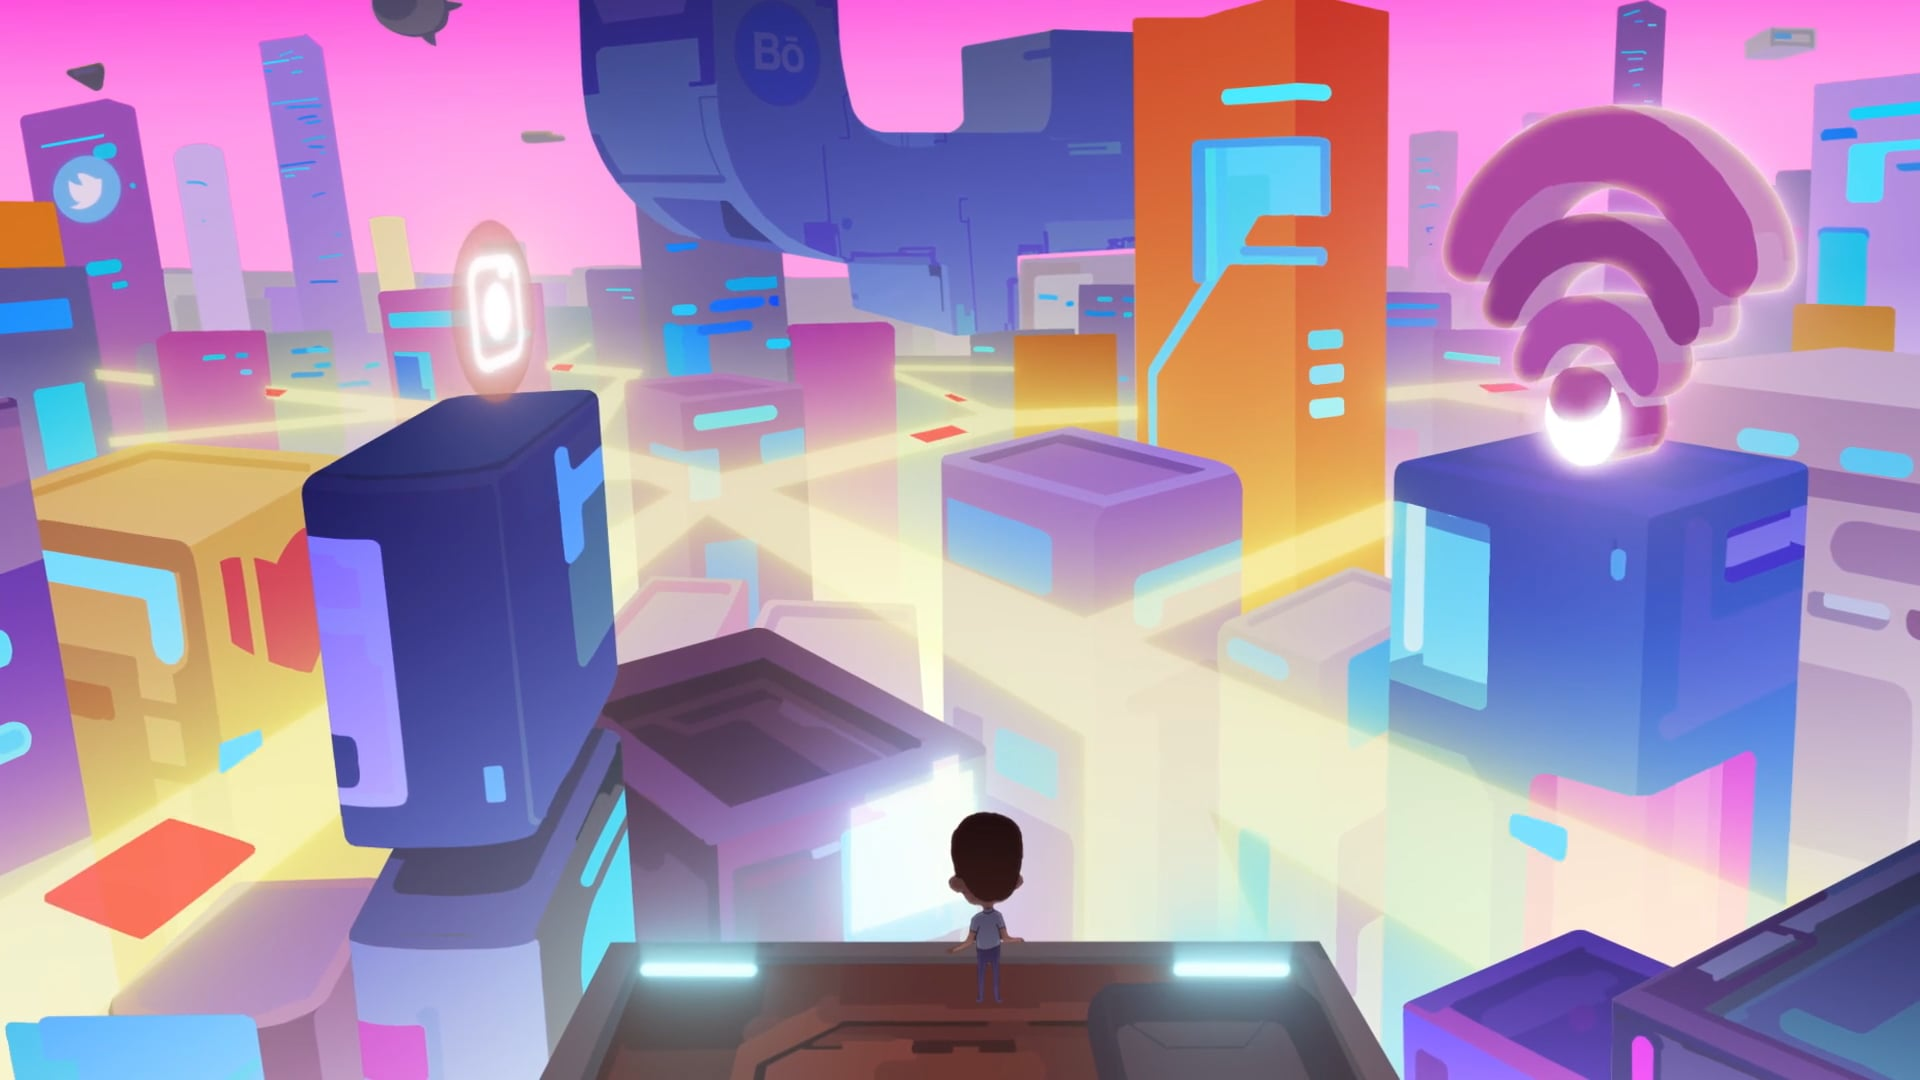 BẢO VỆ TRẺ EM TRÊN MẠNG   2D Animated Video - DeeDee Animation Studio